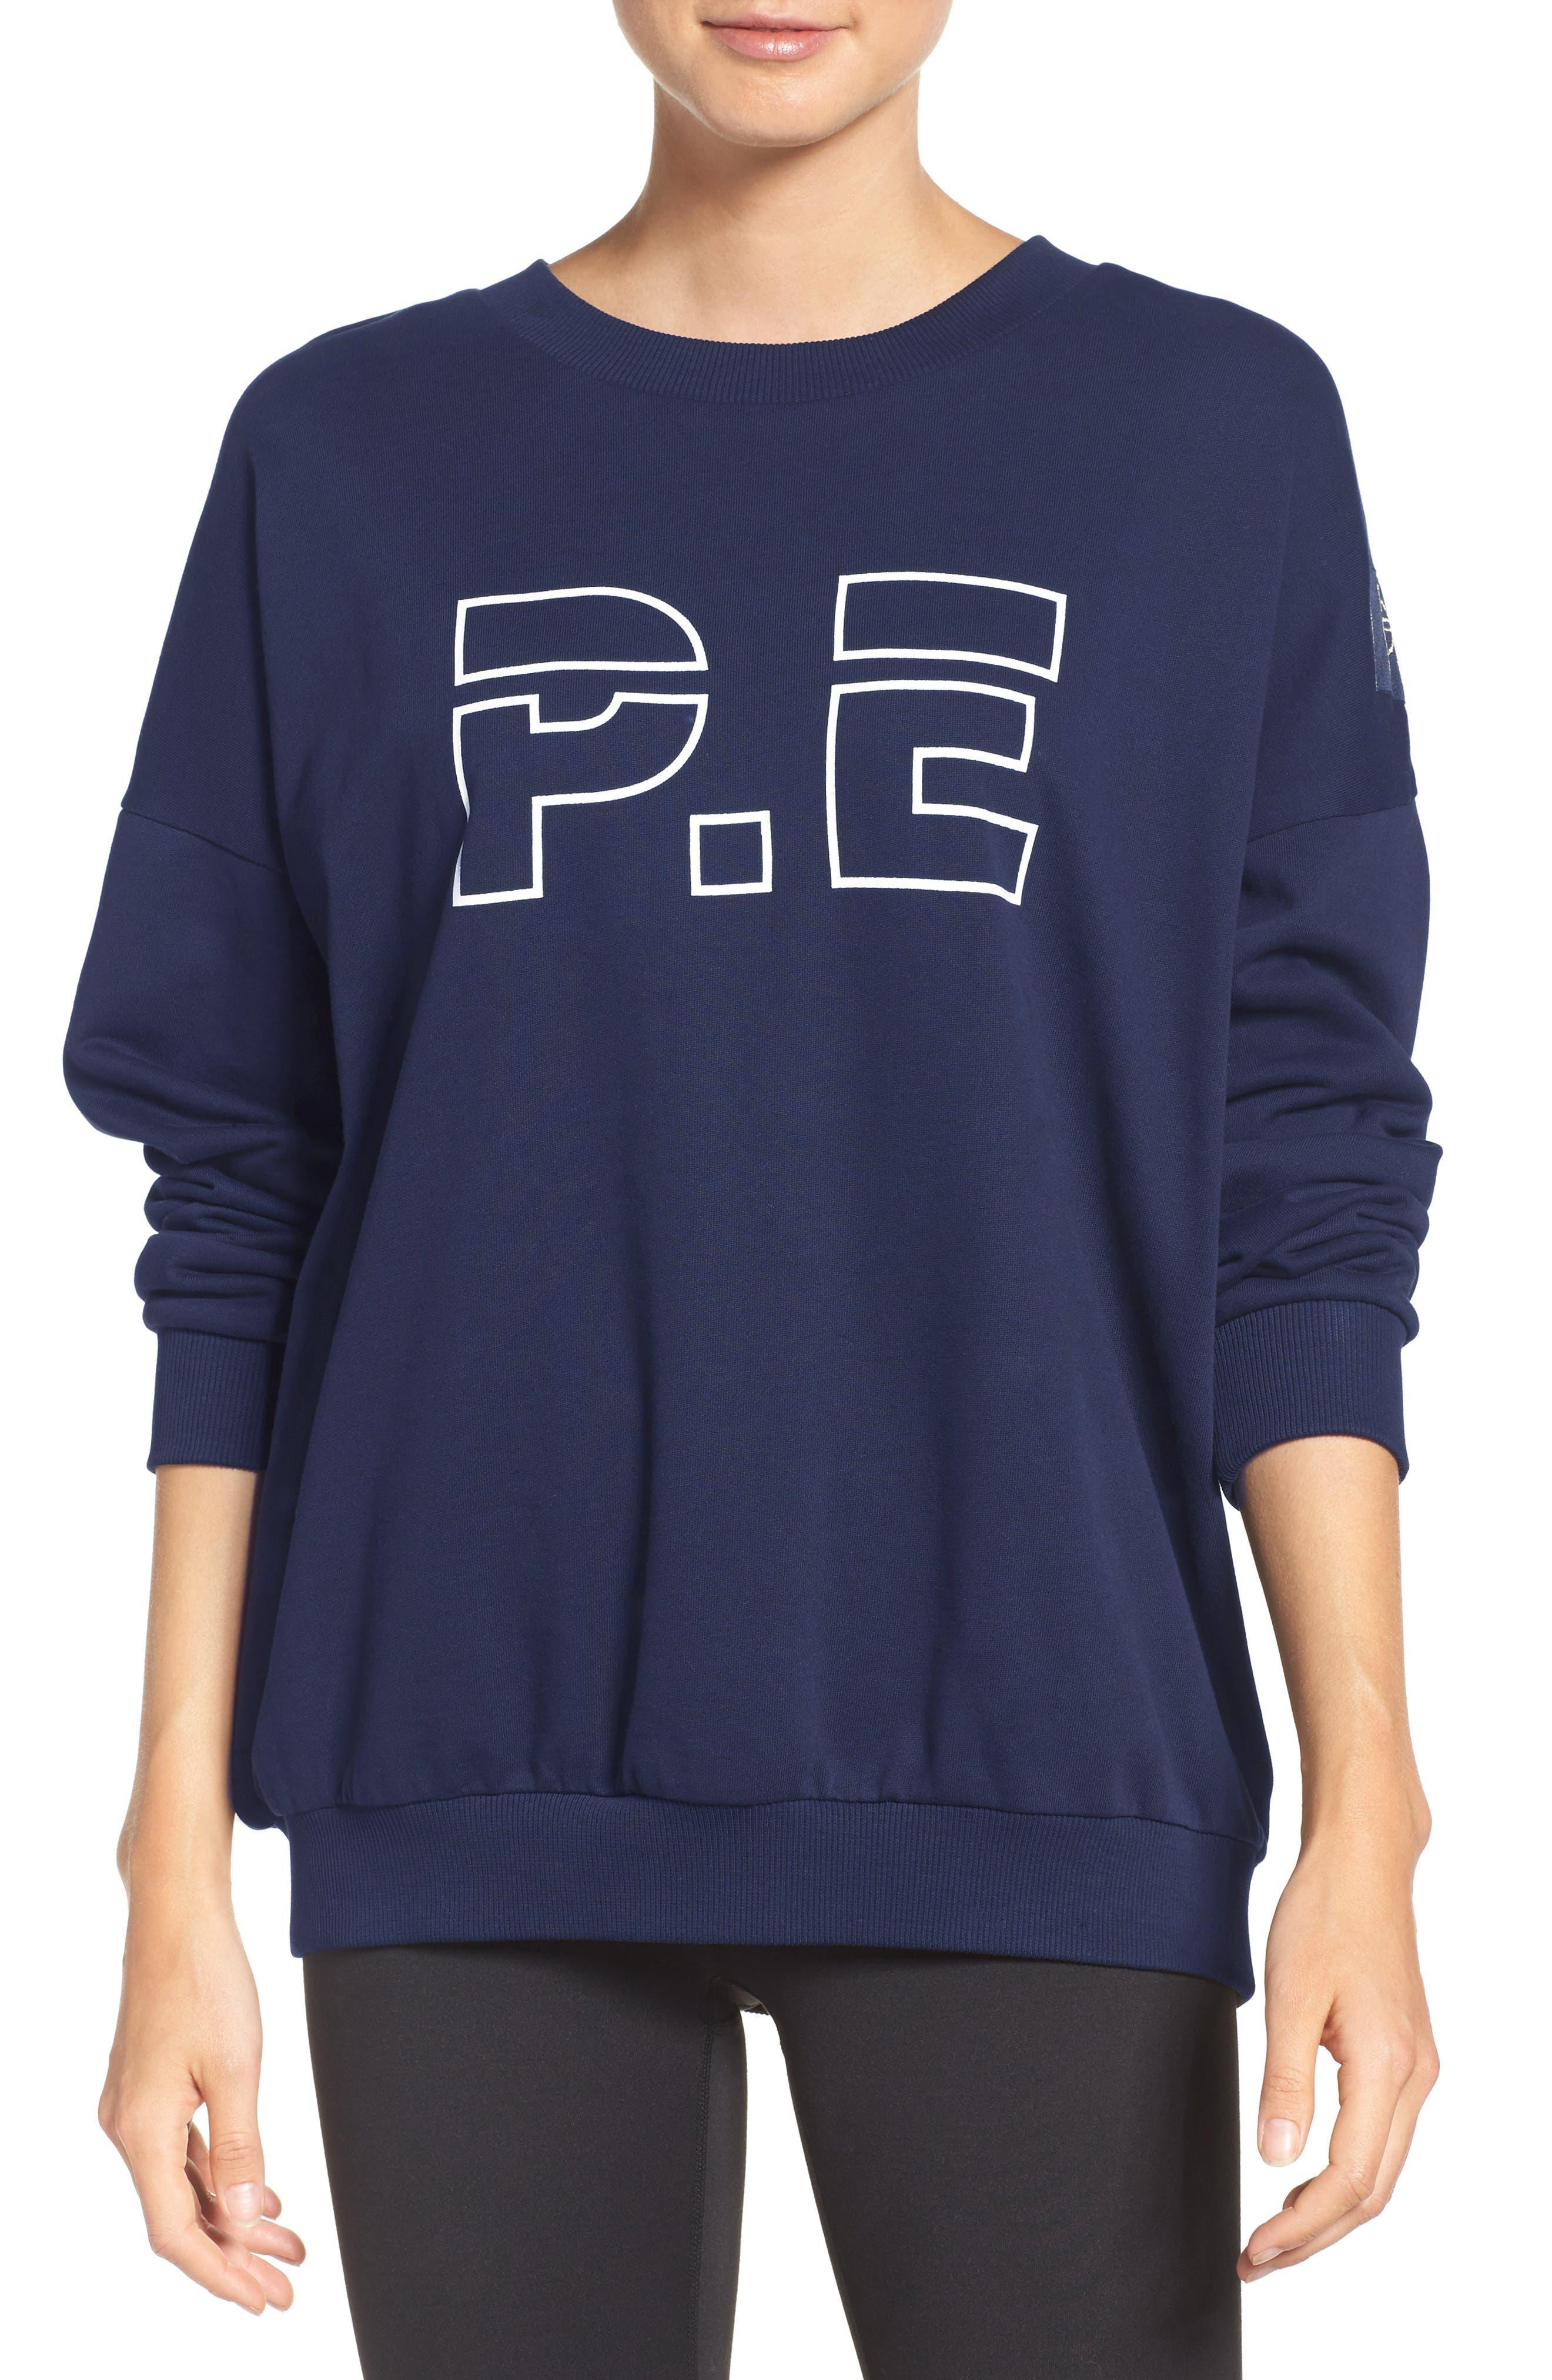 P.E. Nation The Heads Up Sweatshirt,                             Main thumbnail 1, color,                             Navy